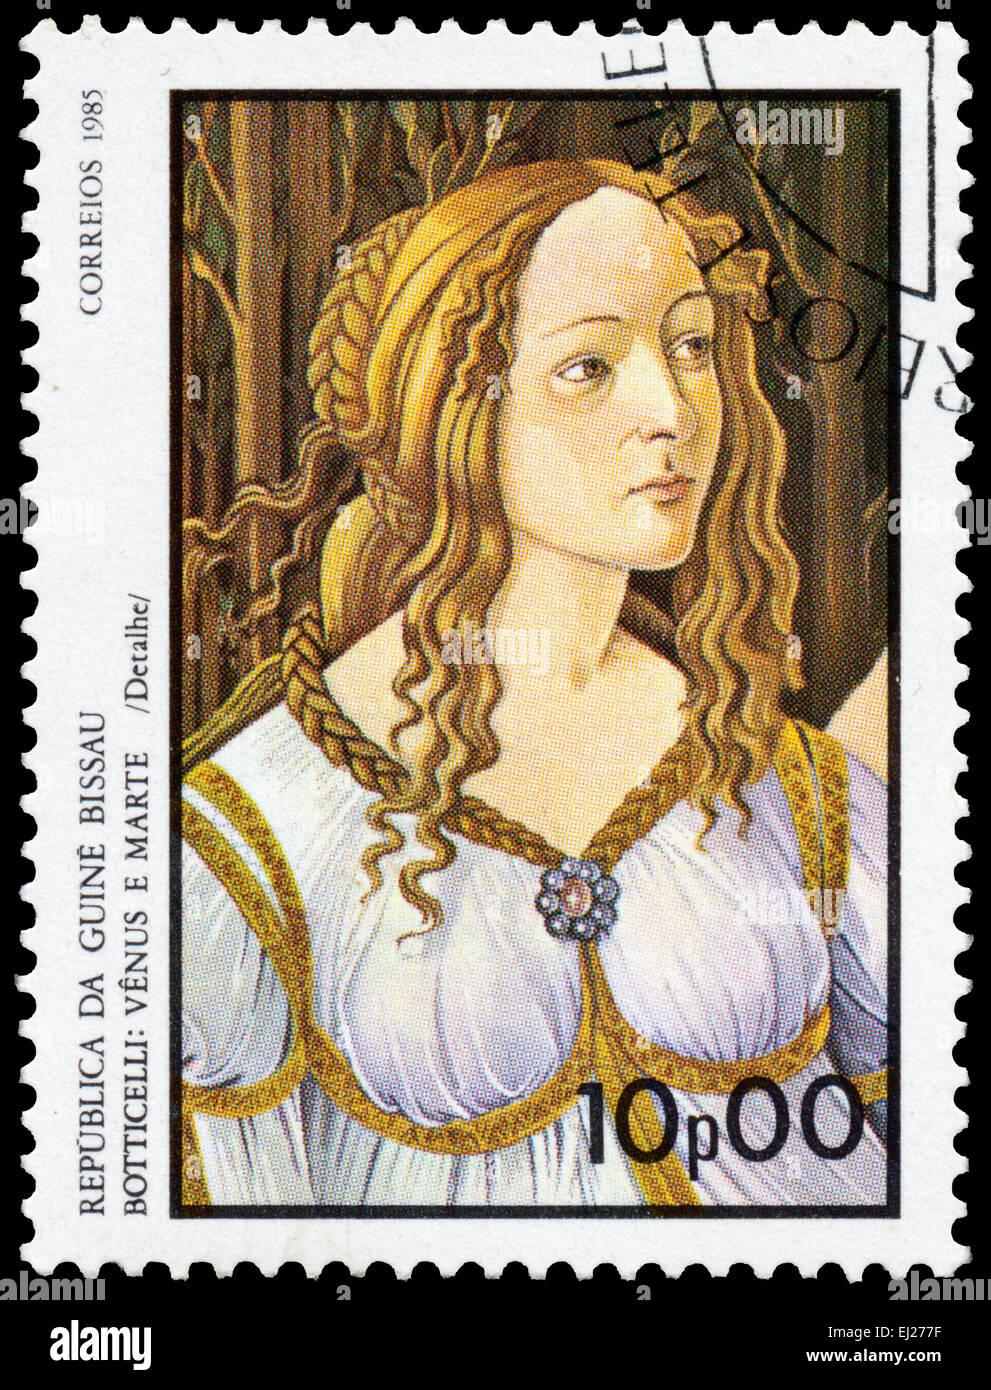 GUINEA BISSAU - CIRCA 1985: Stamp printed in Guinea-Bissau shows Venus and Mars - detail - by Botticelli, circa Stock Photo